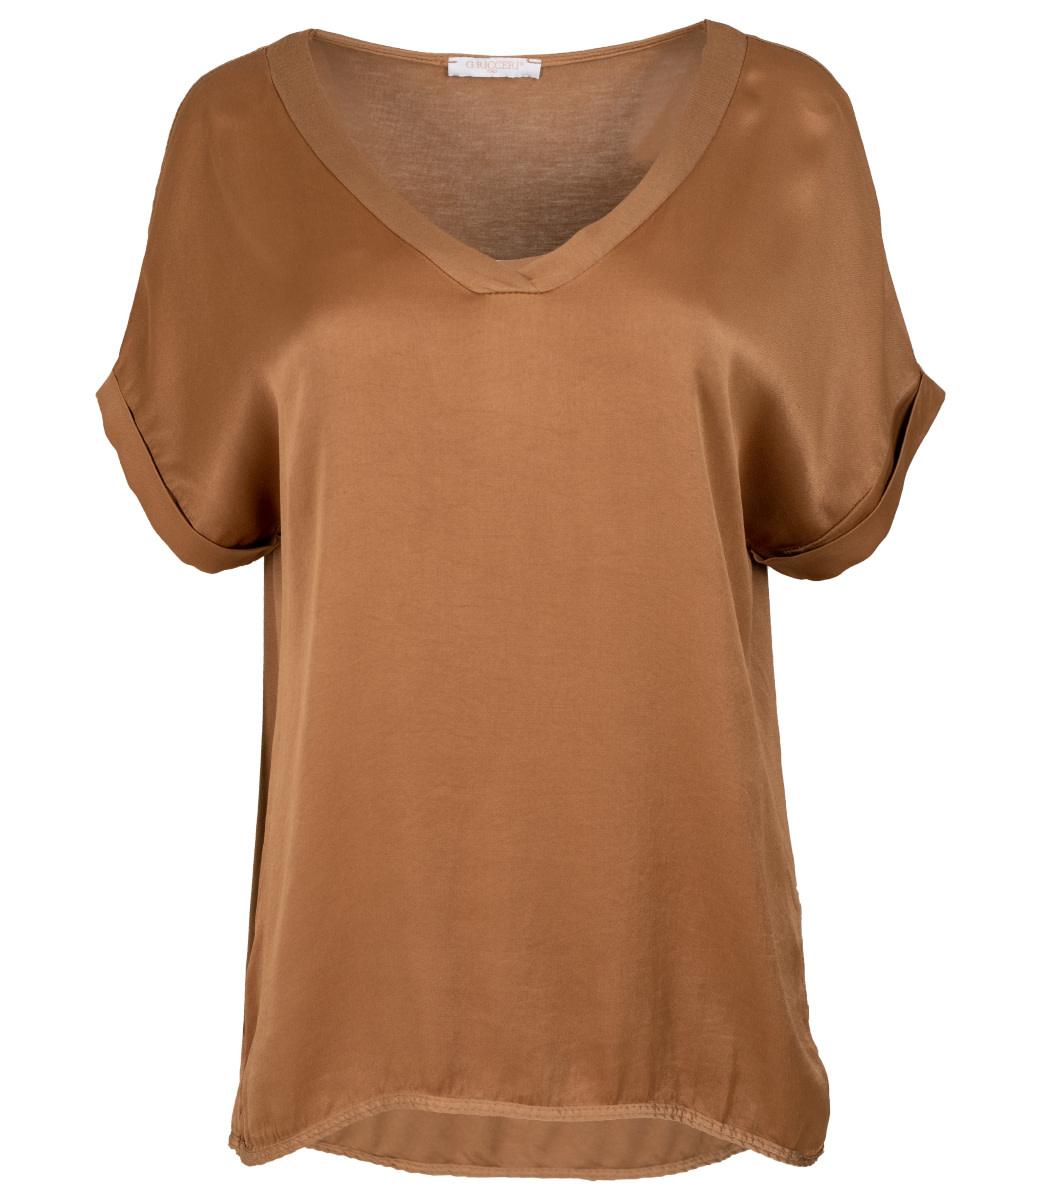 Gemma Ricceri Shirt camel silk touch v hals